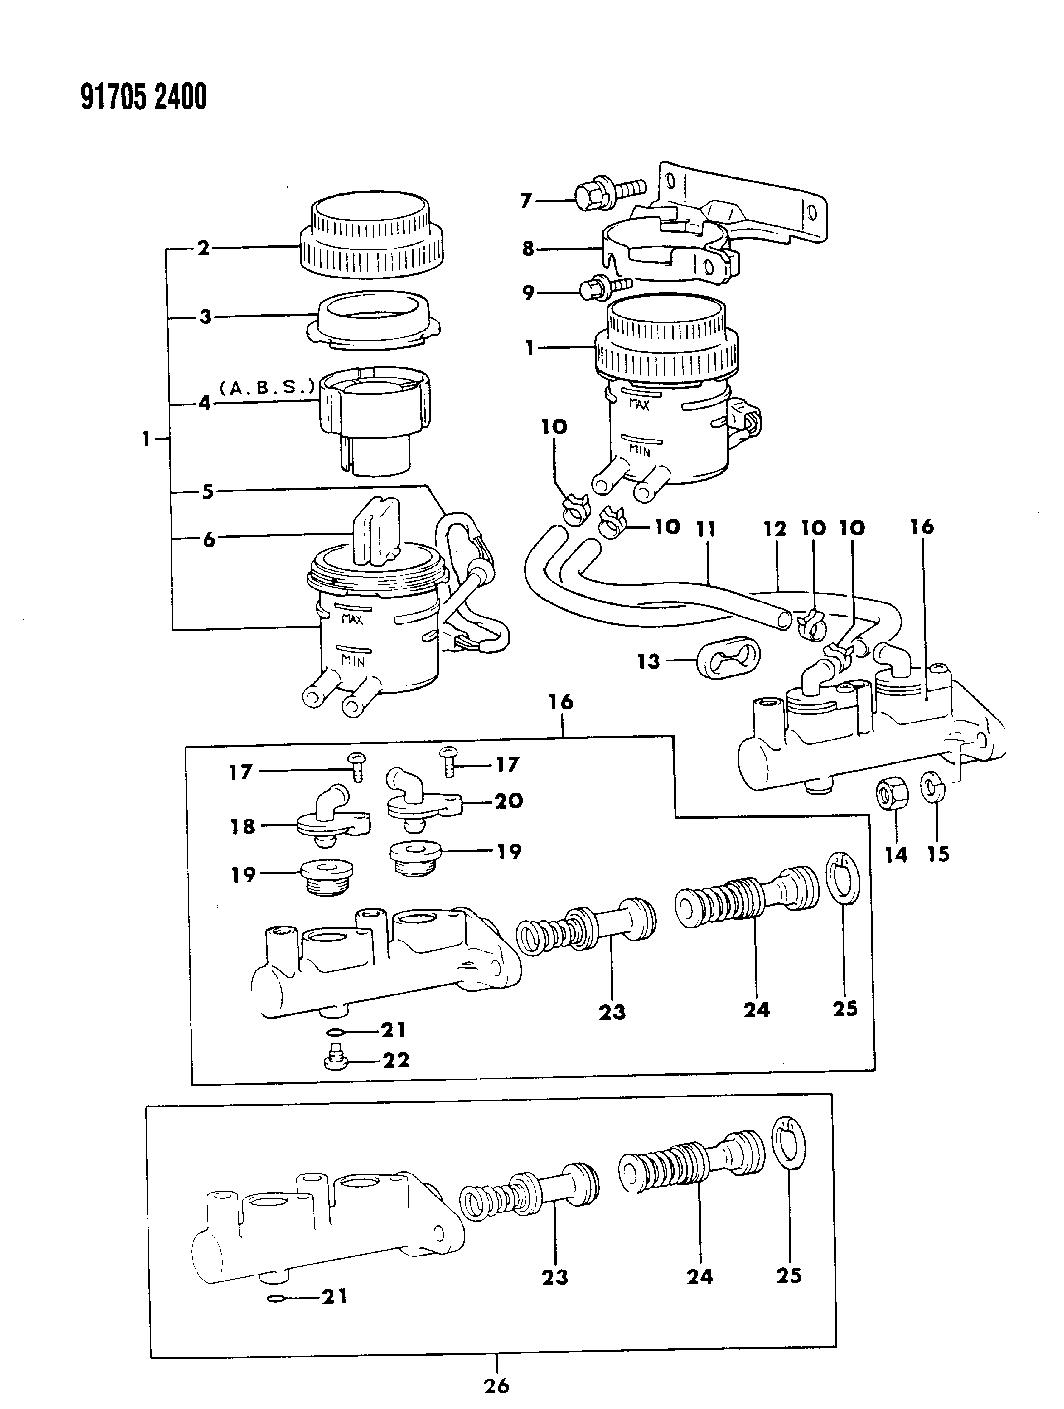 Mb238309